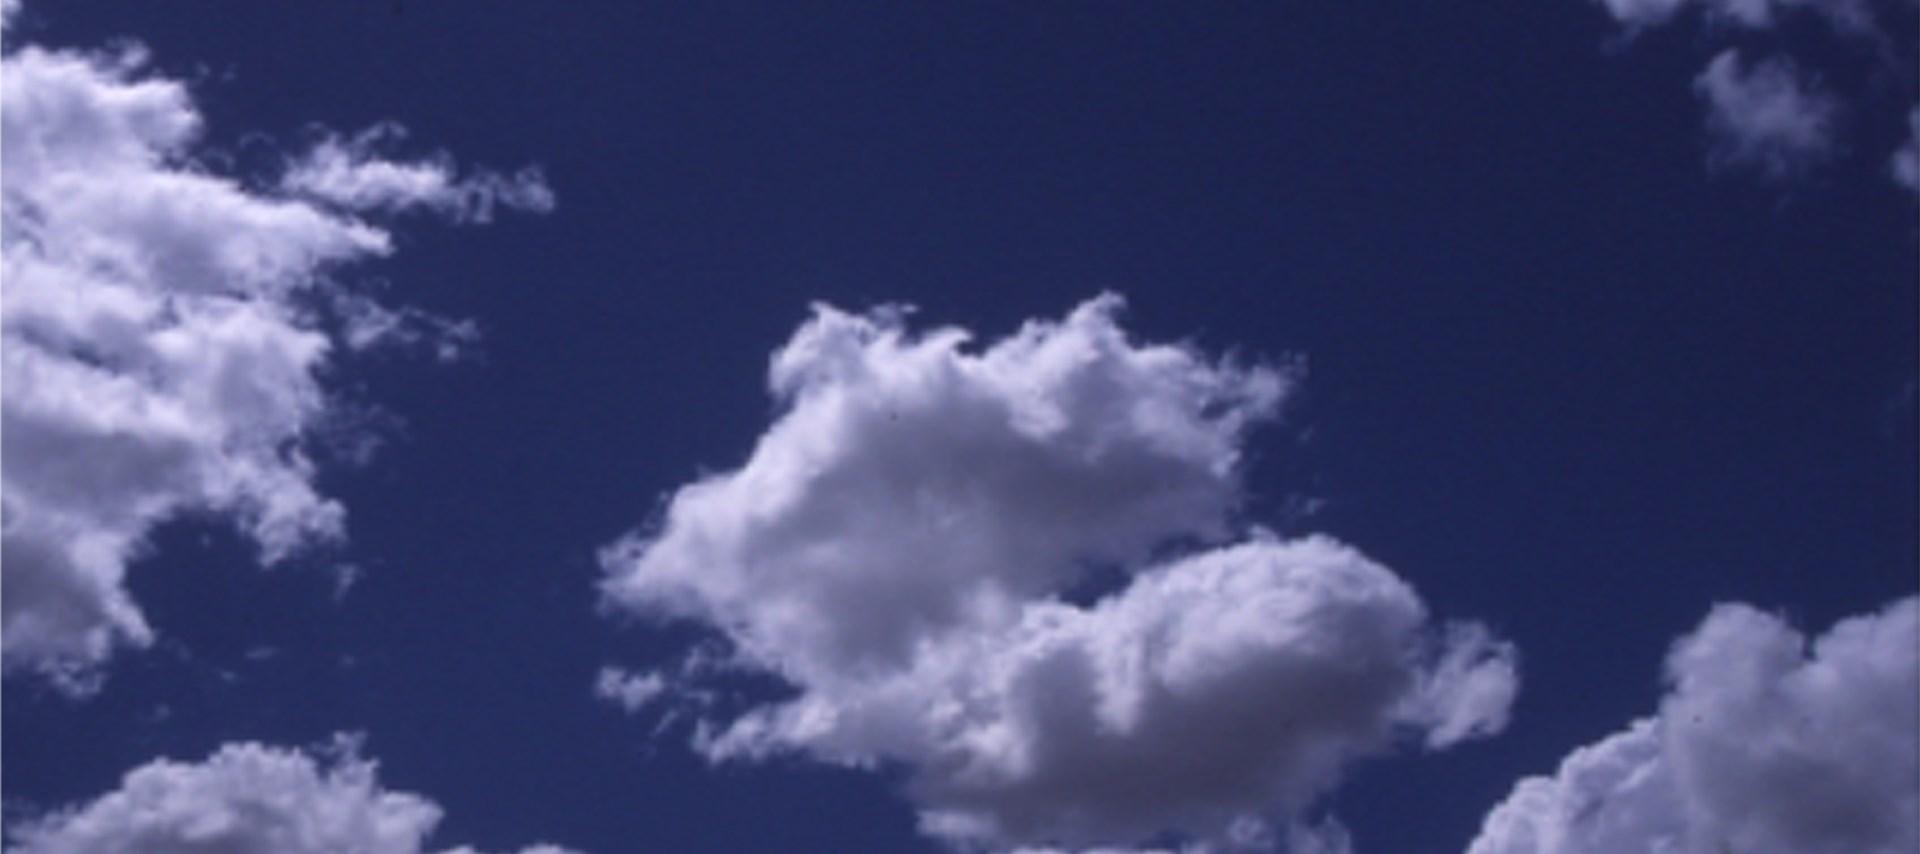 Alec Finlay: Participations -  Wind blown cloud